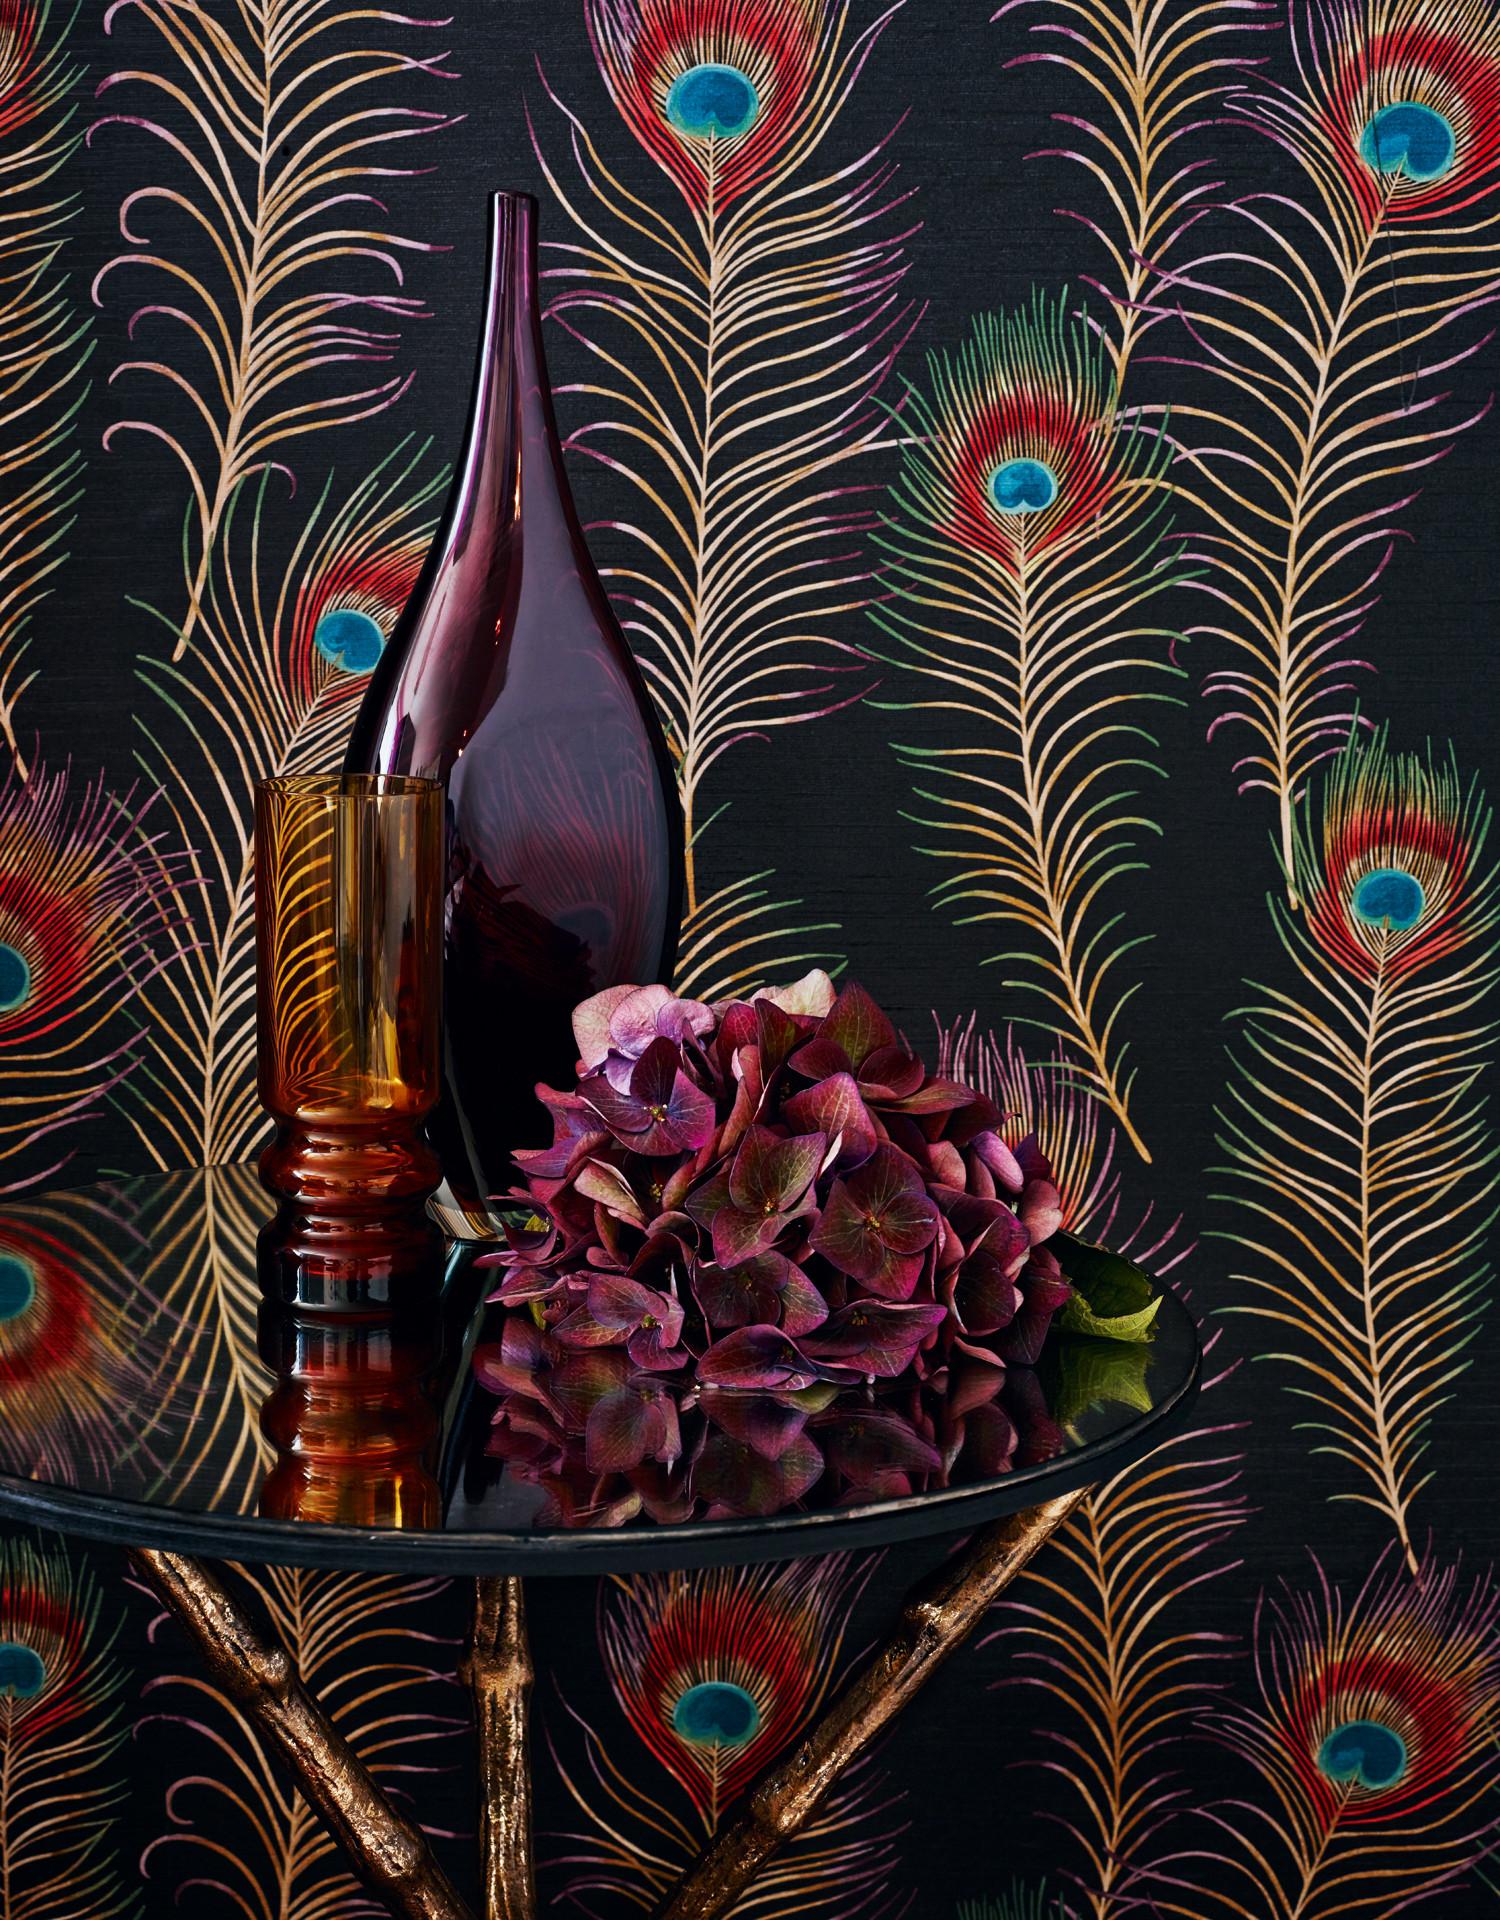 Themis wallpaper_lr.jpg